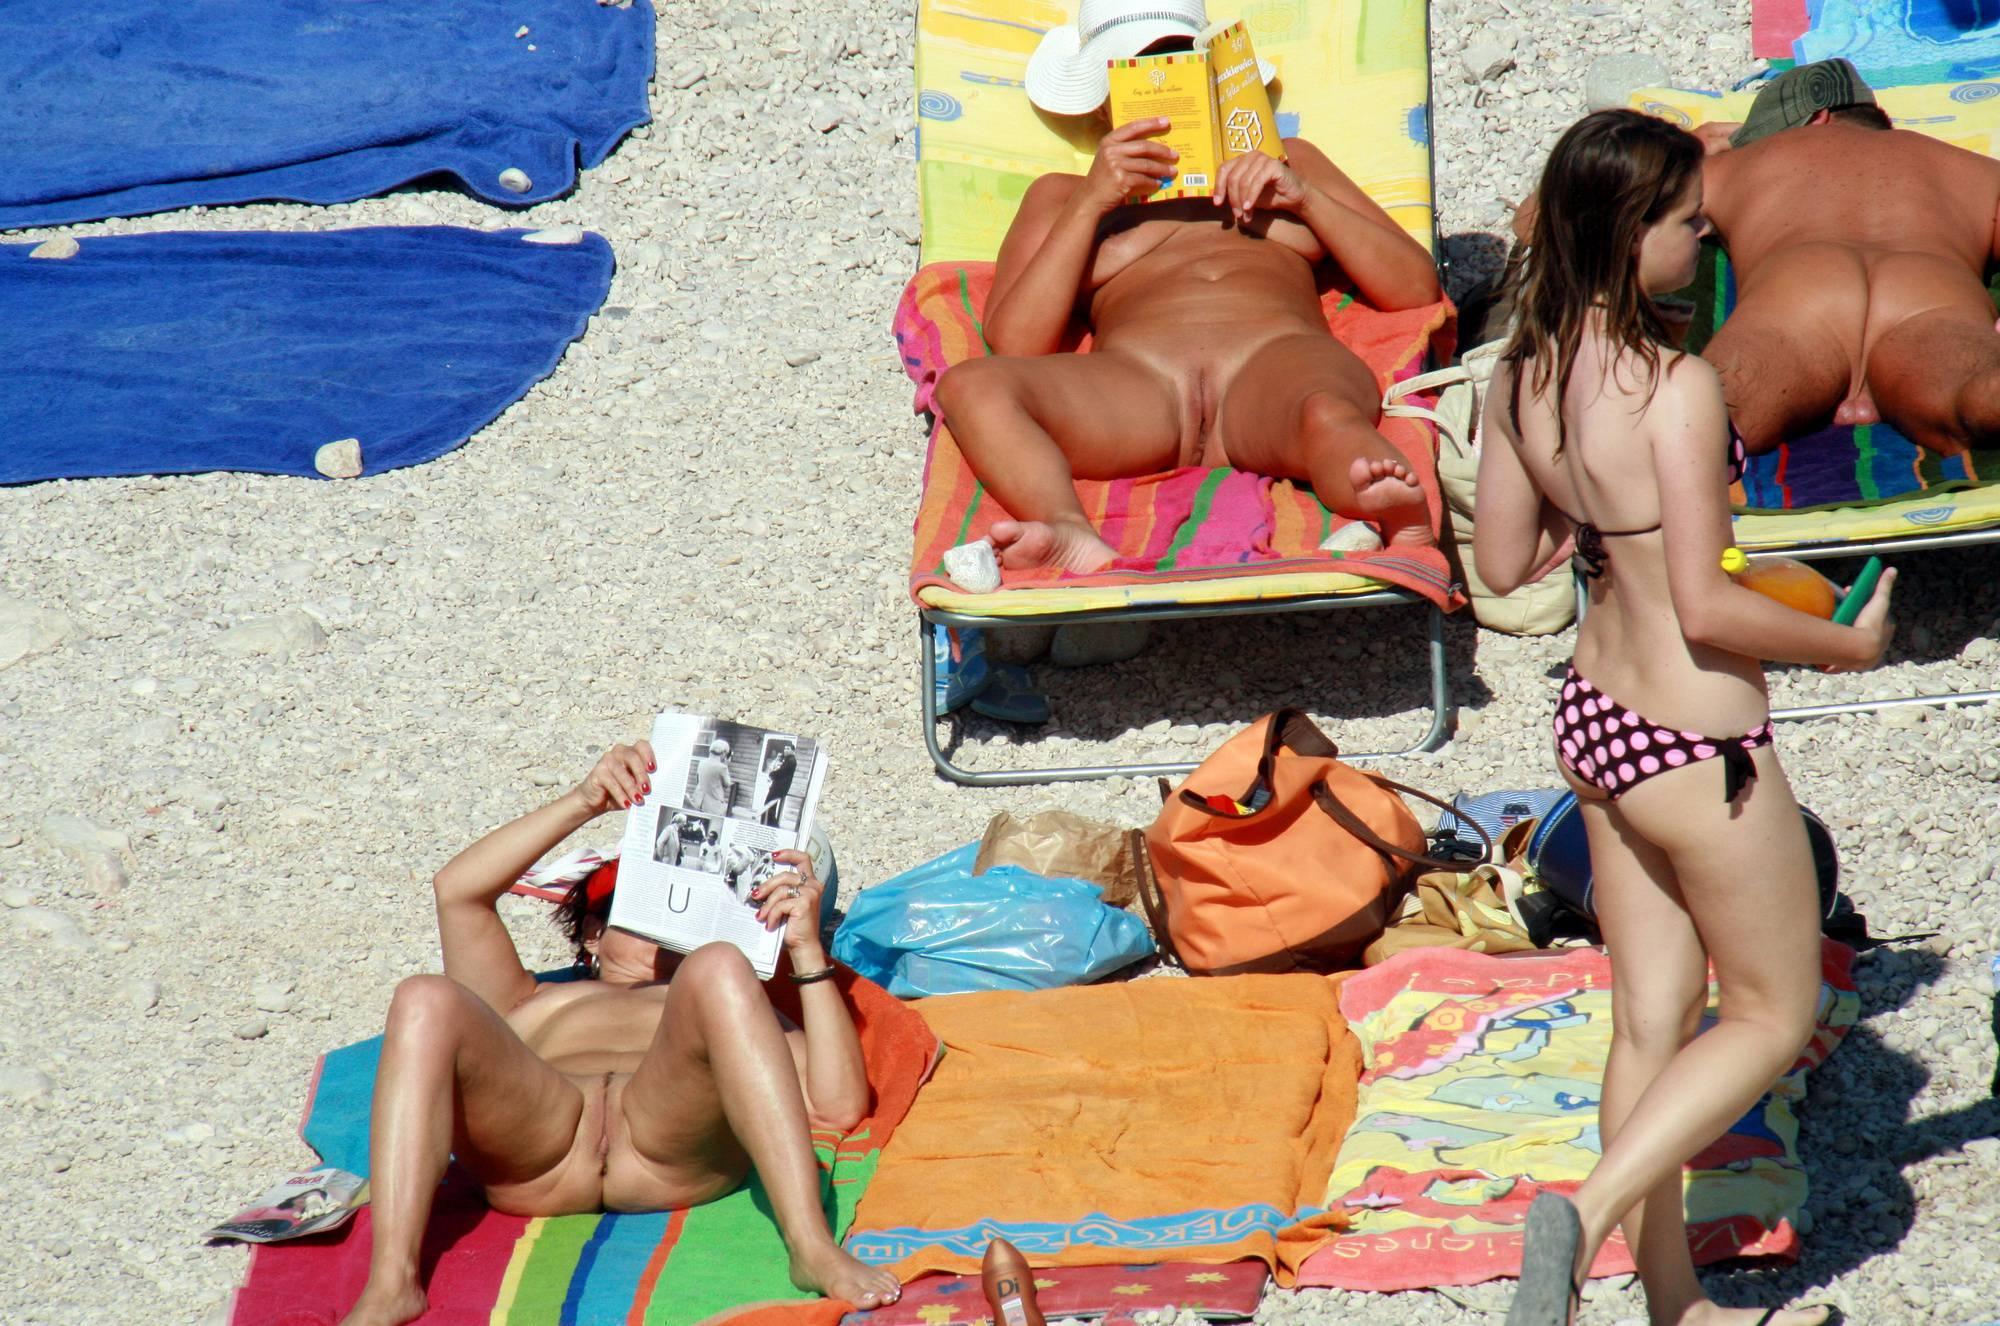 Naturist Beach Relaxation - 3